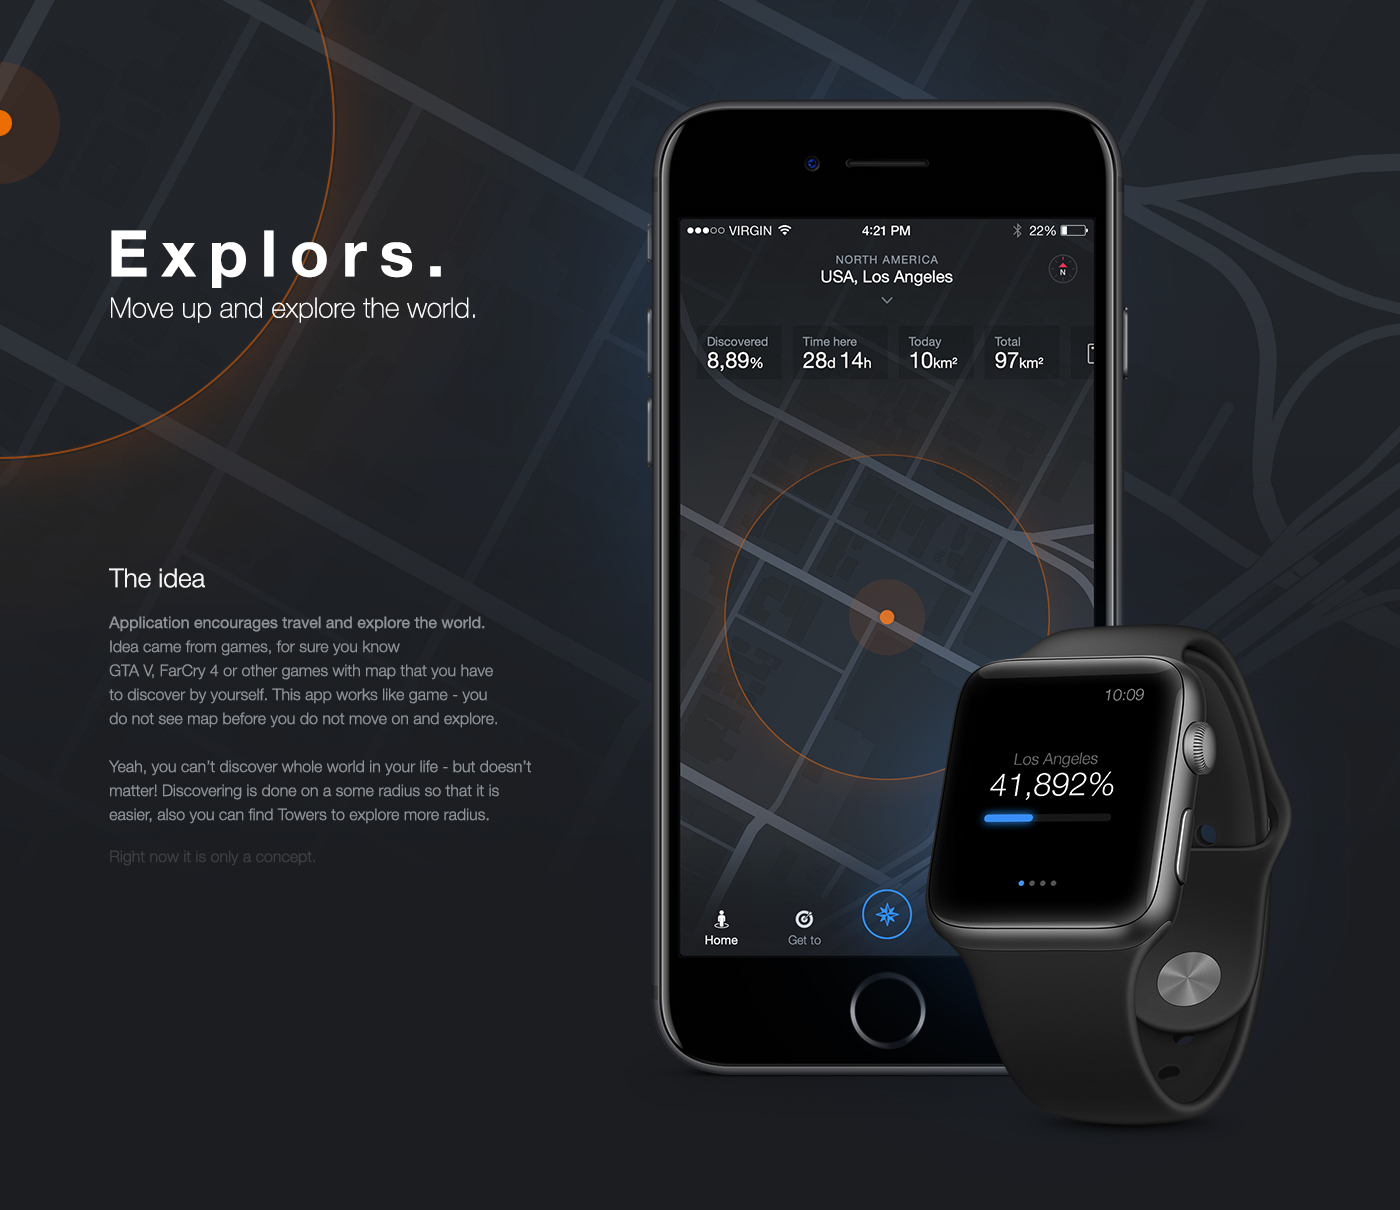 Explors explore the world app on behance explore the world app on behance gumiabroncs Choice Image